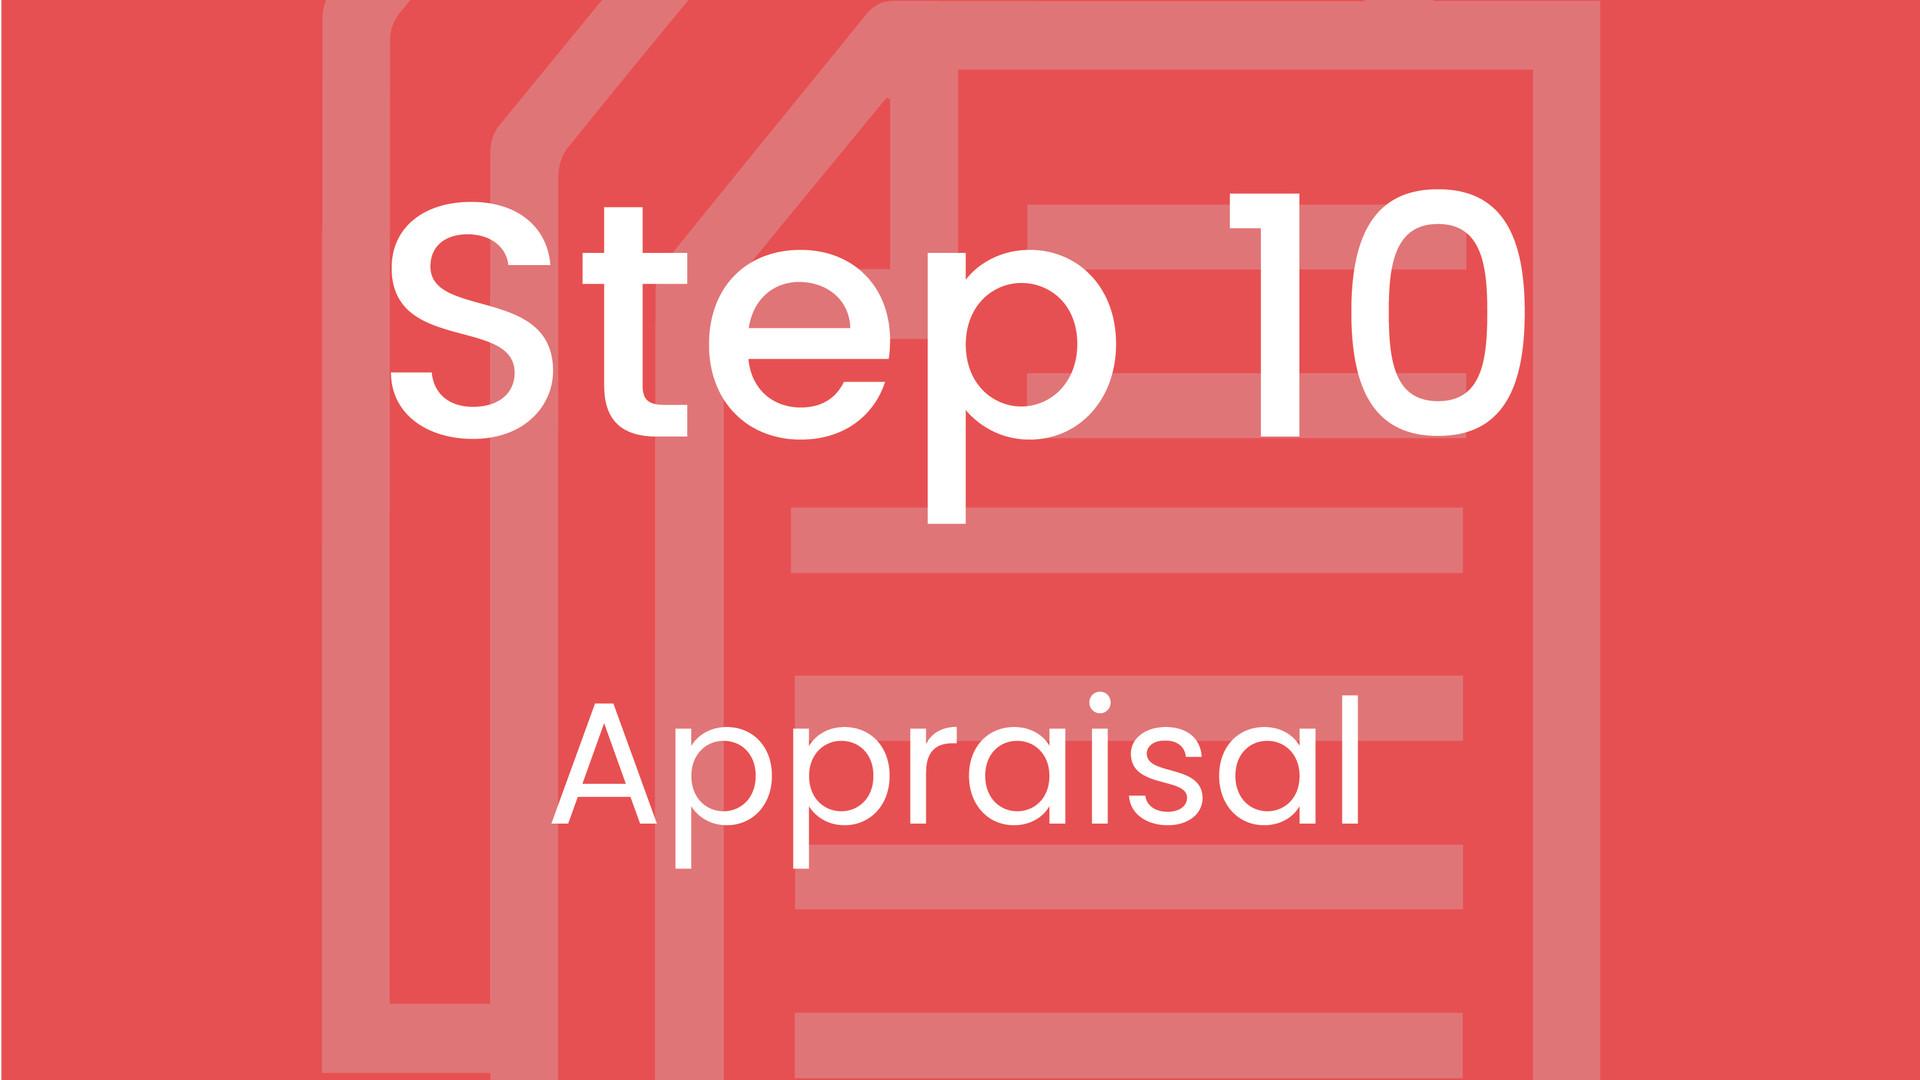 Step 10: Appraisal